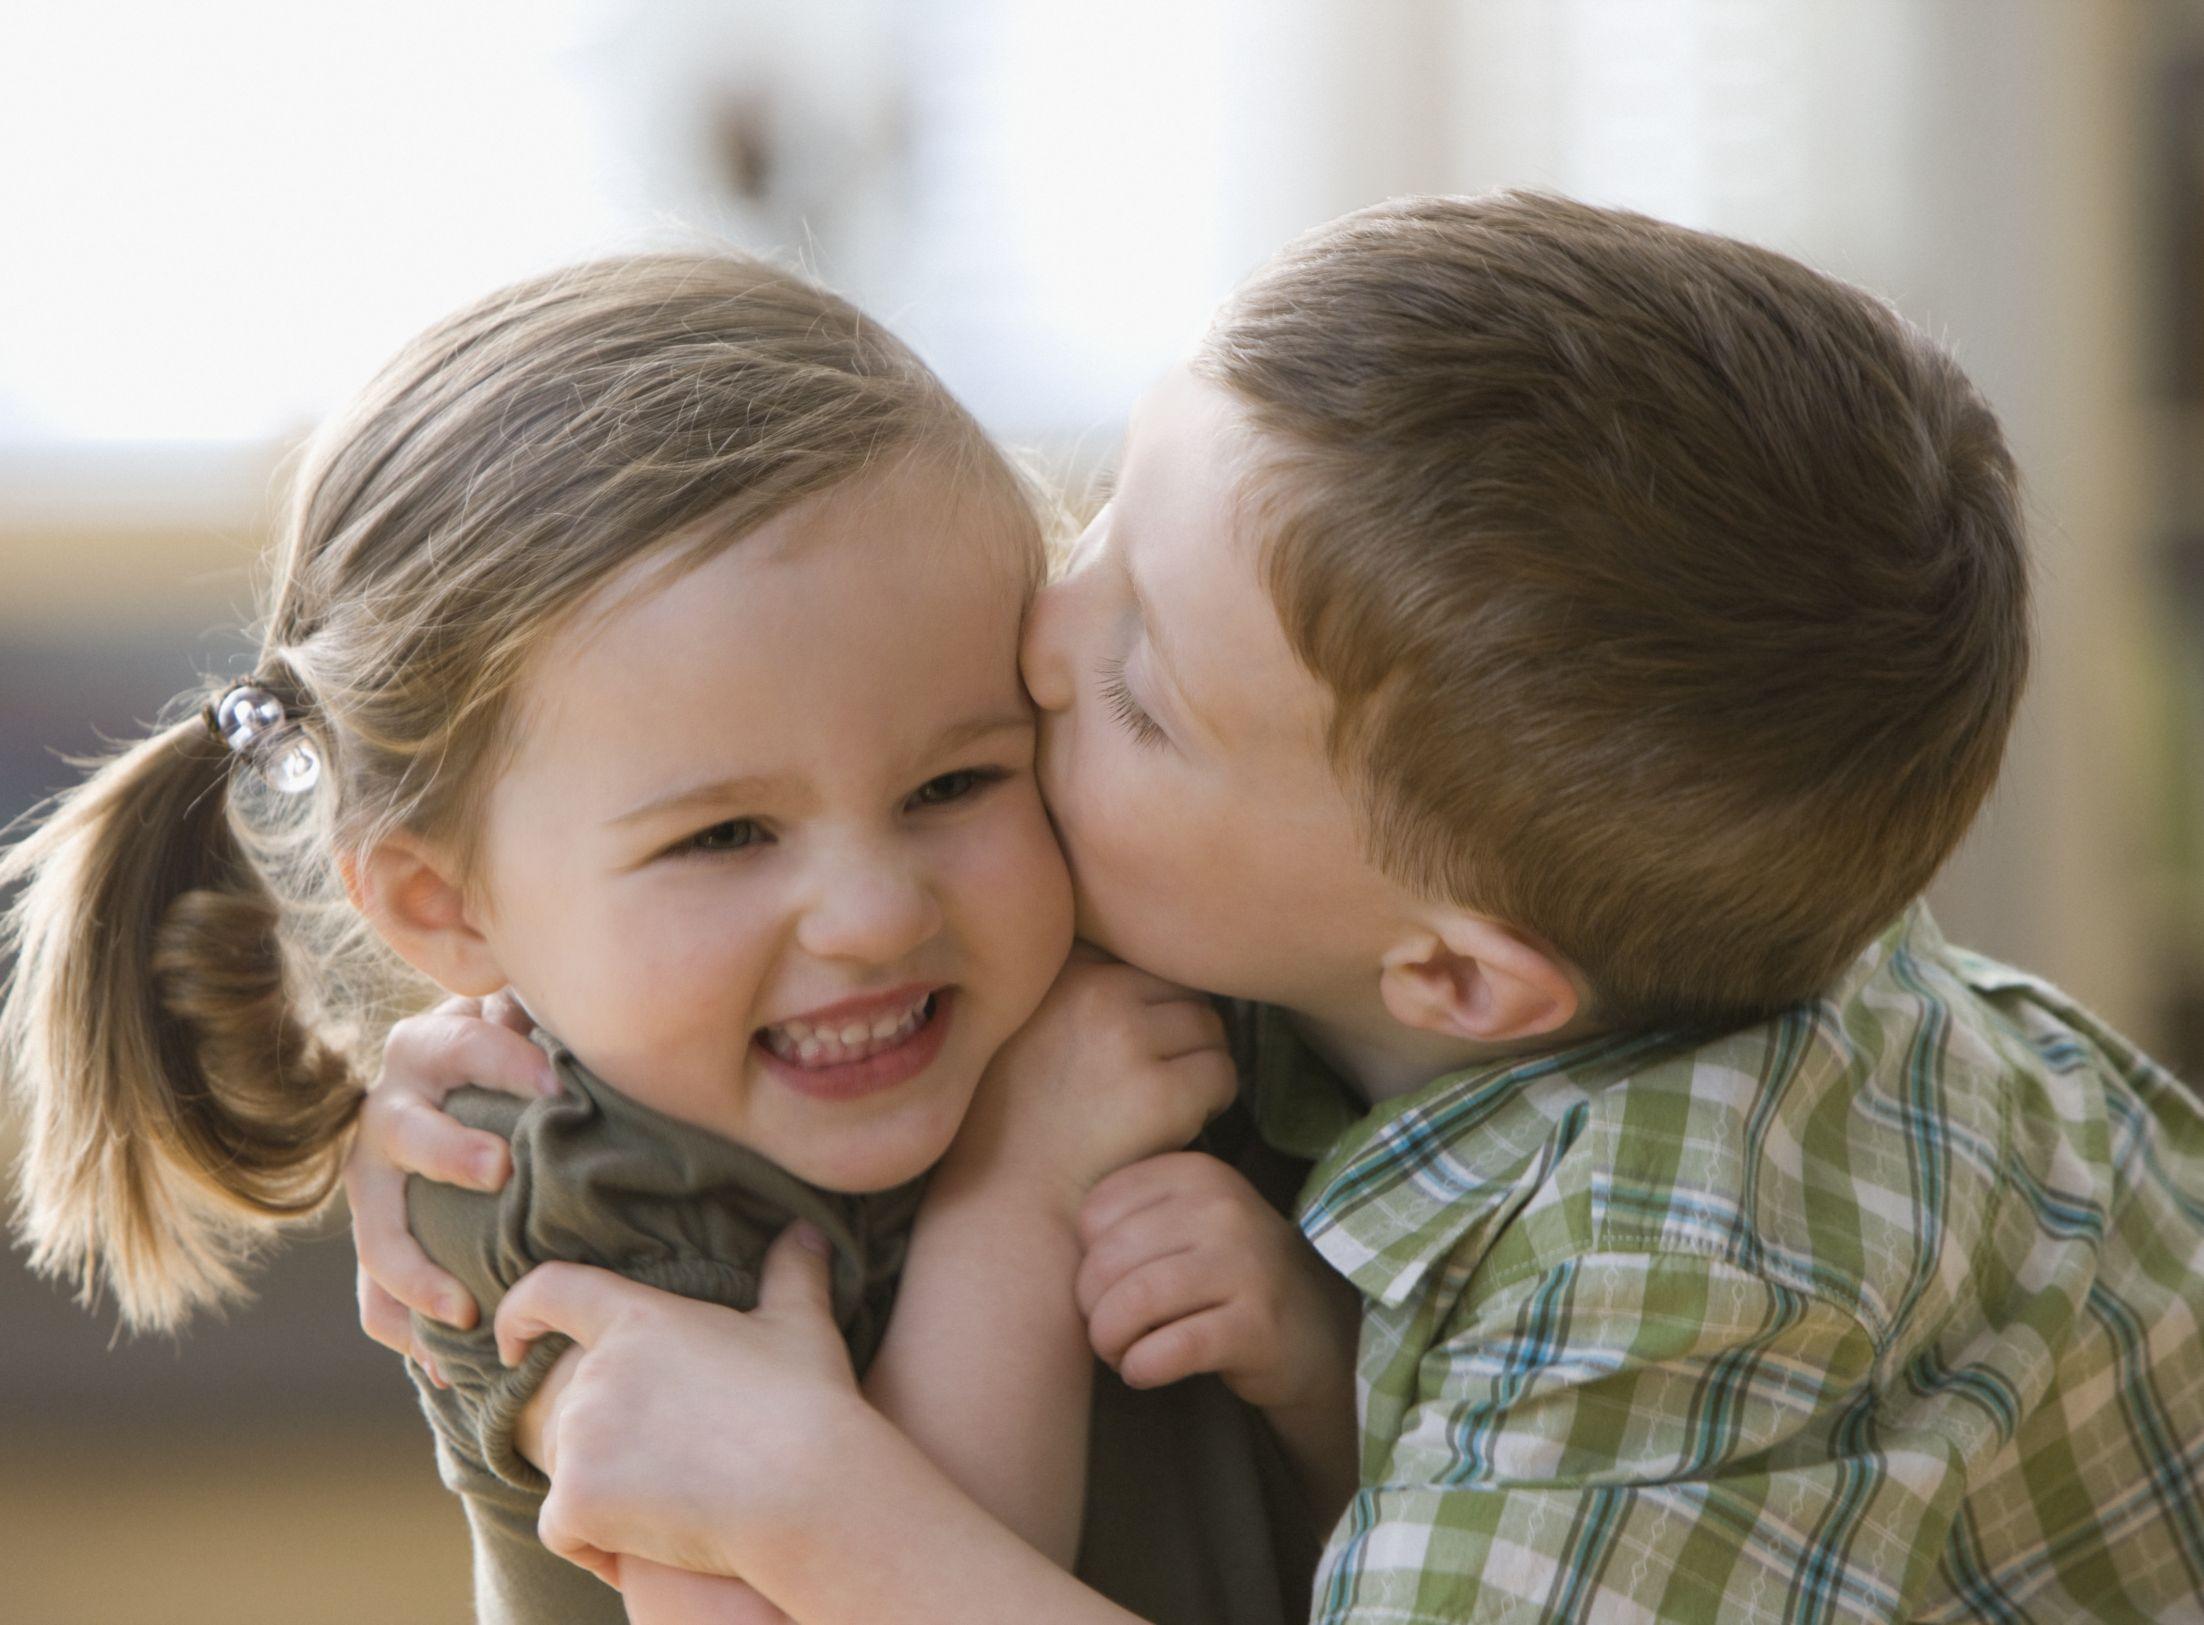 Boy Kissing Girl Blank Template Imgflip